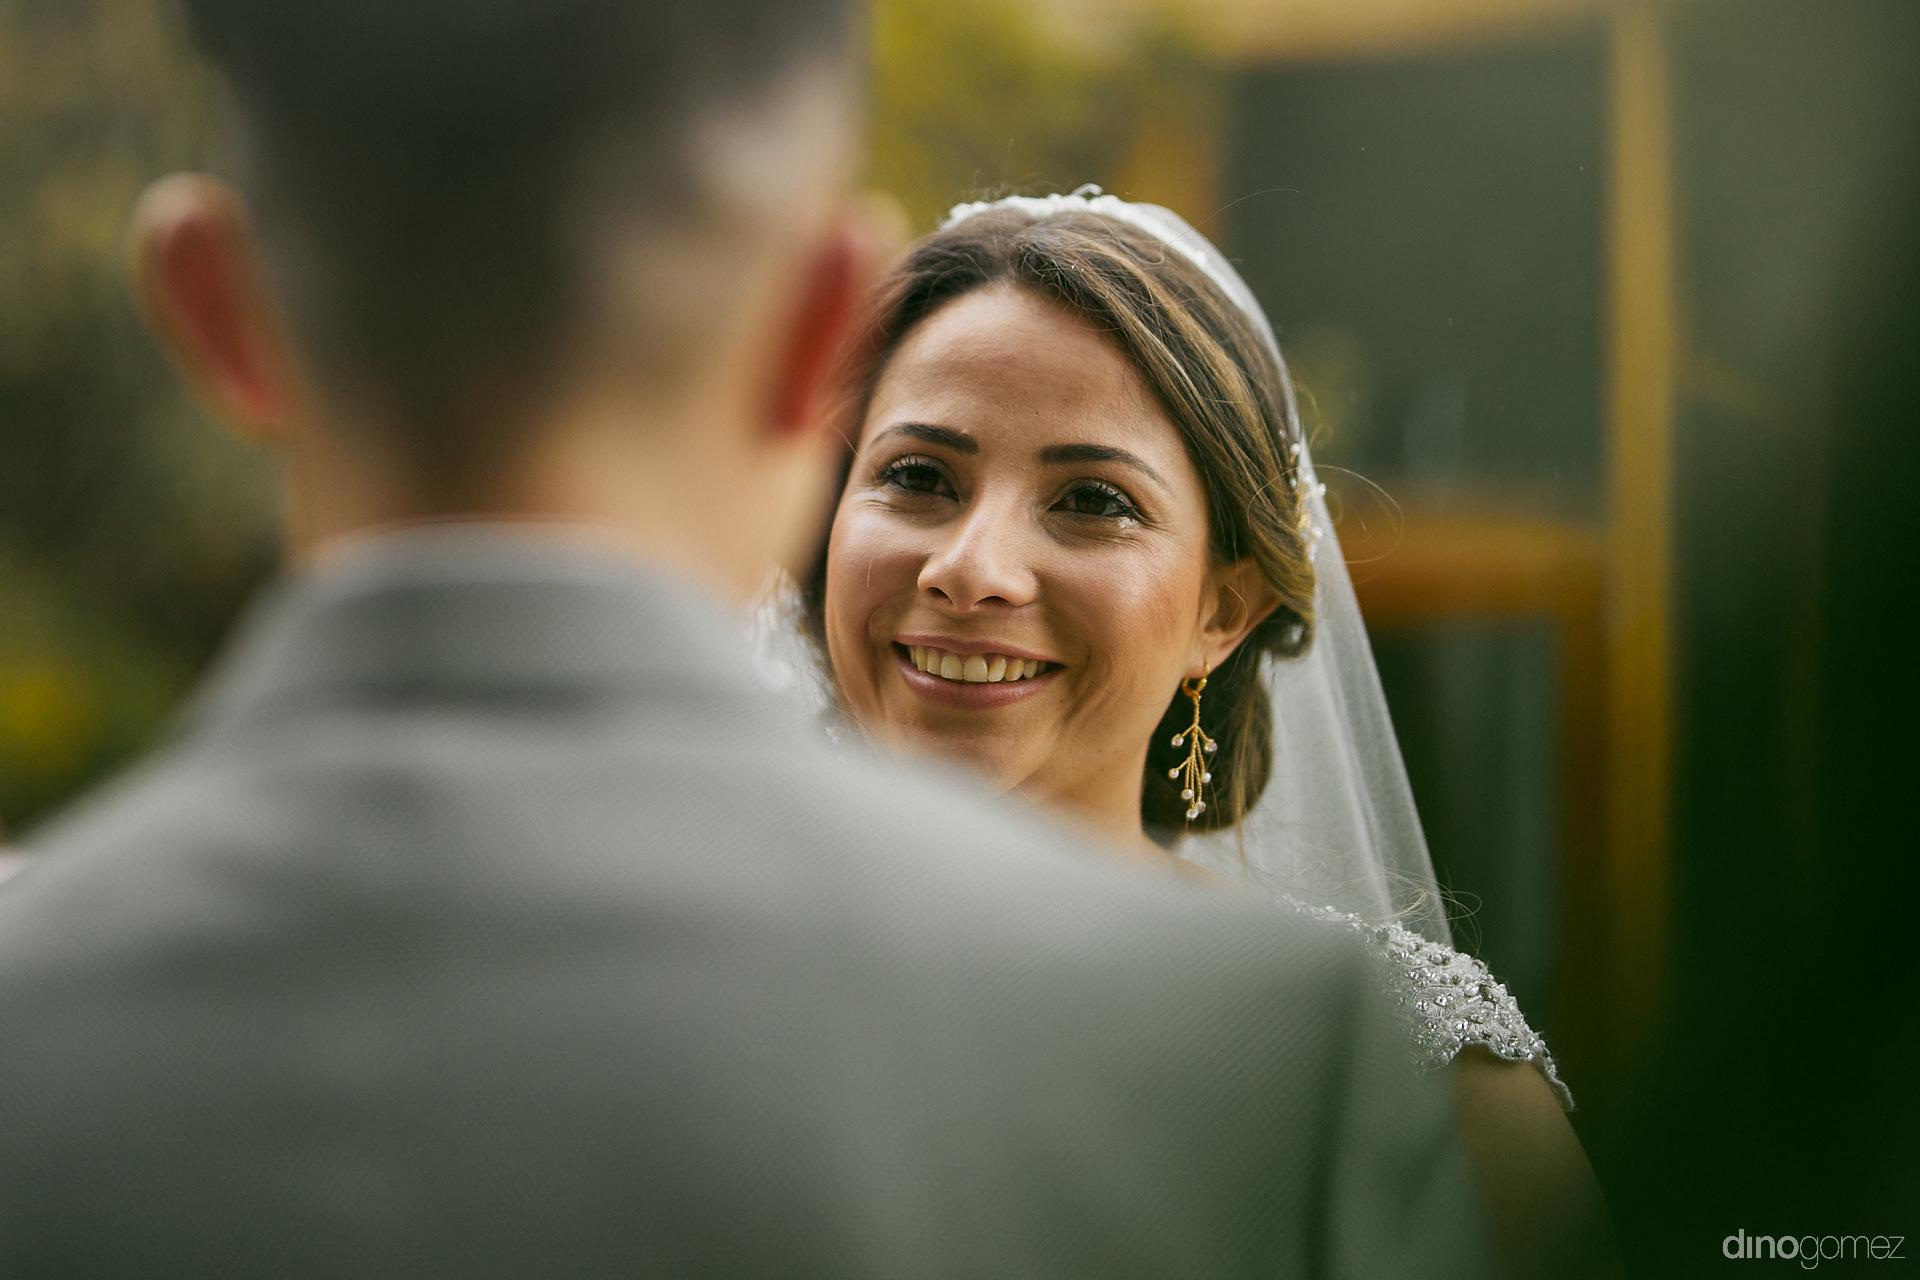 005 - Diy Budget Destination Weddings Can Be Prety Too!